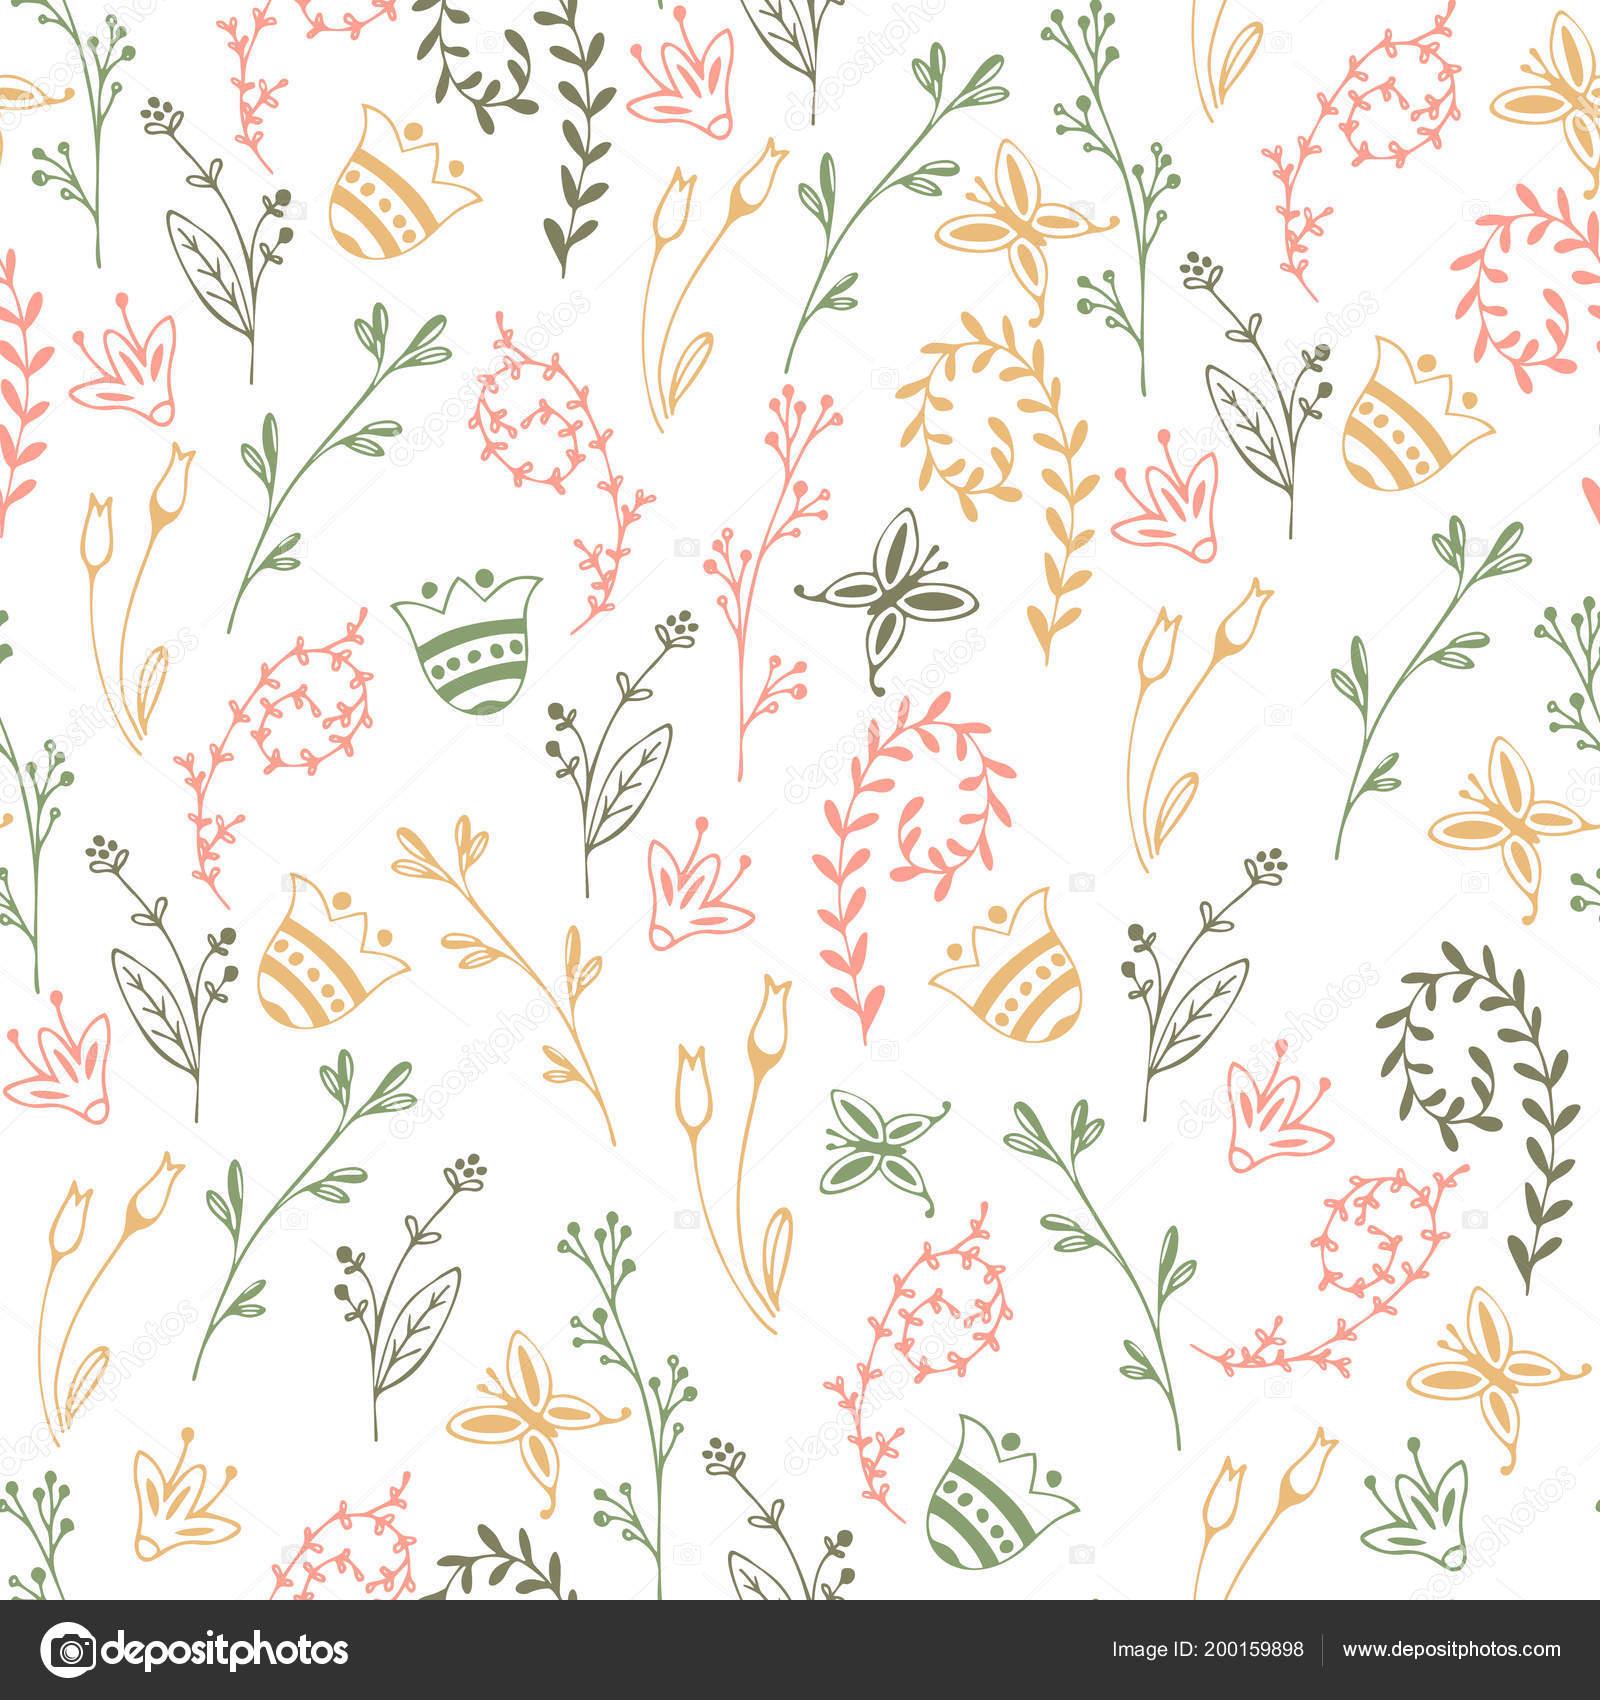 Flower simple minimalistic seamless pattern \u2014 Stock Vector